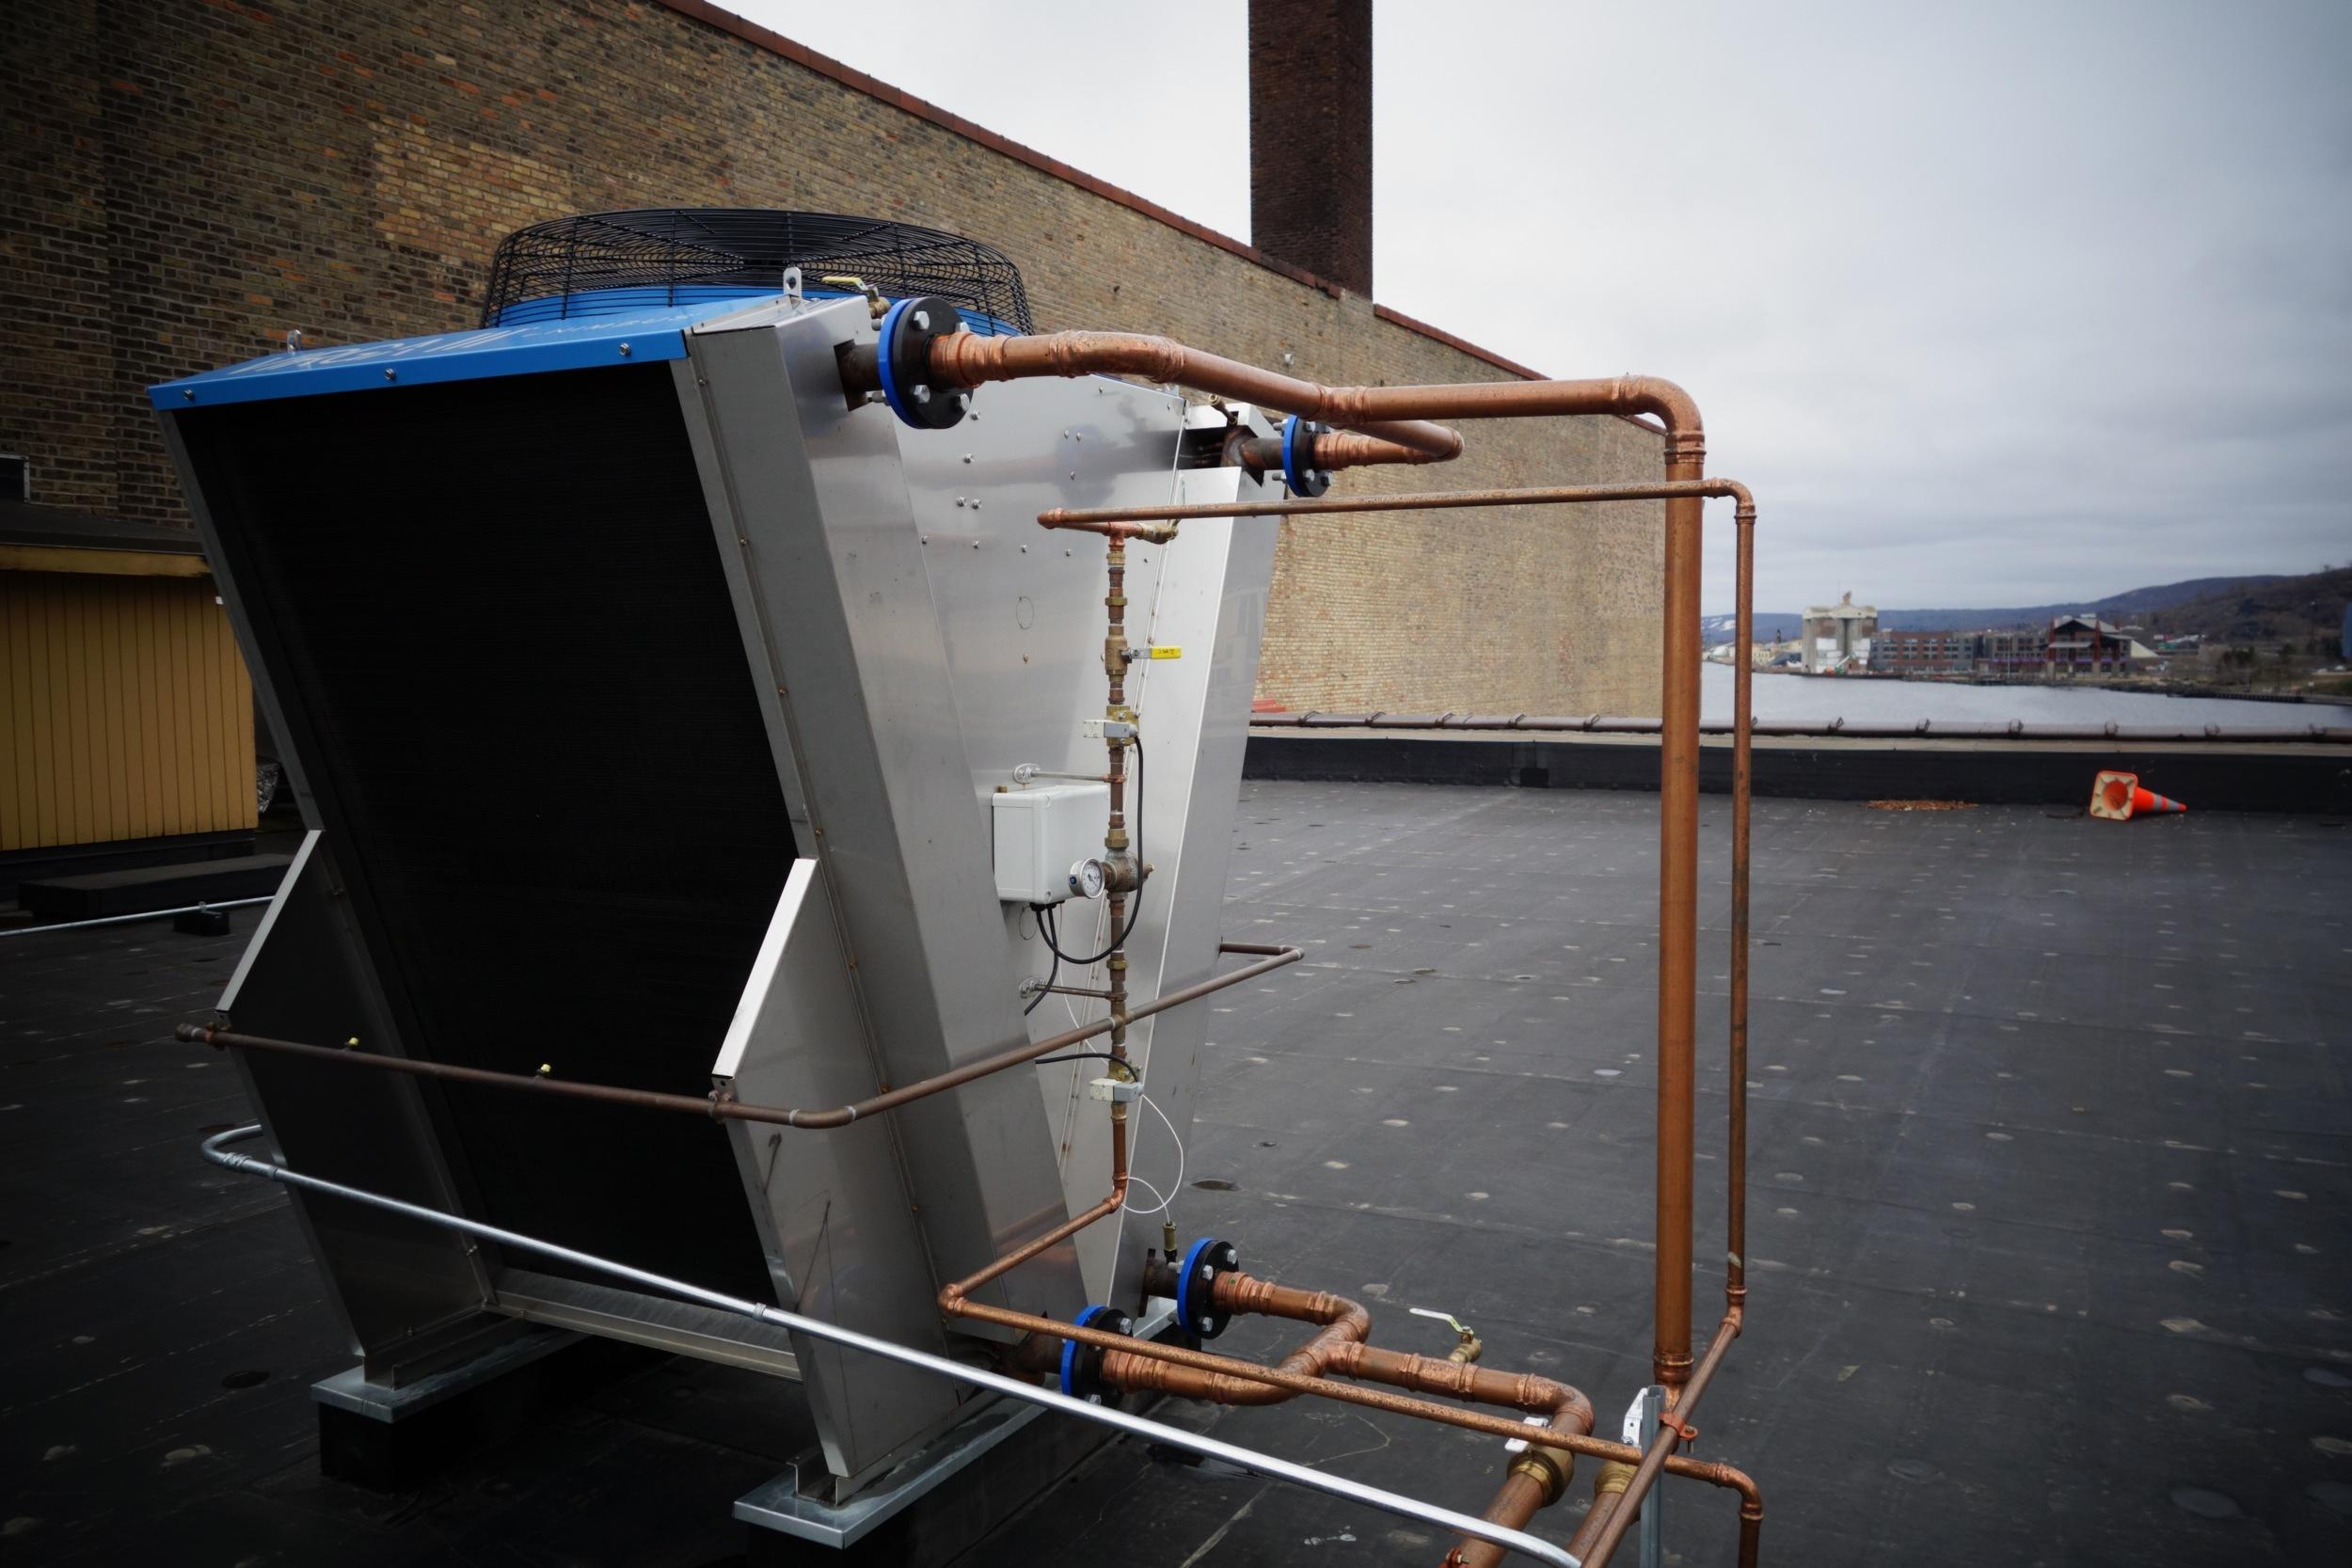 roof top cooler unit